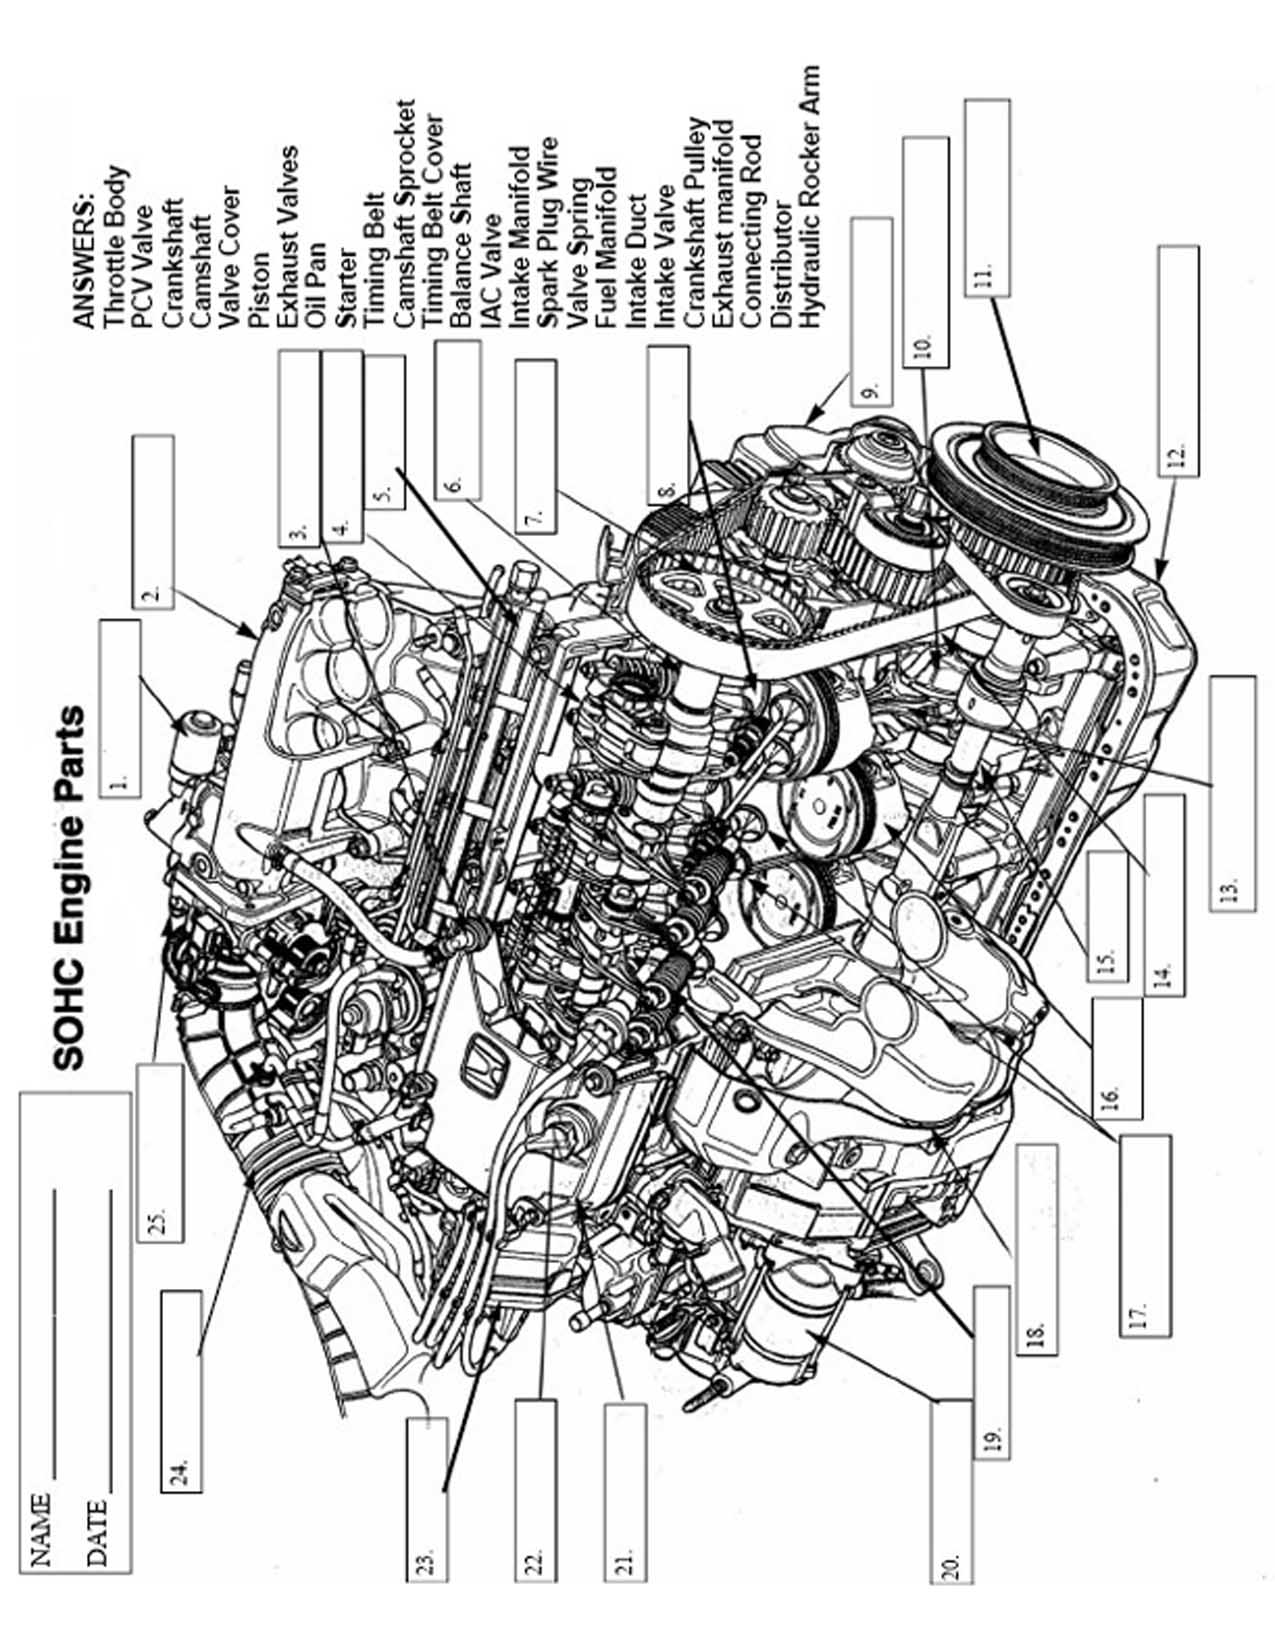 car engine components diagram pdf